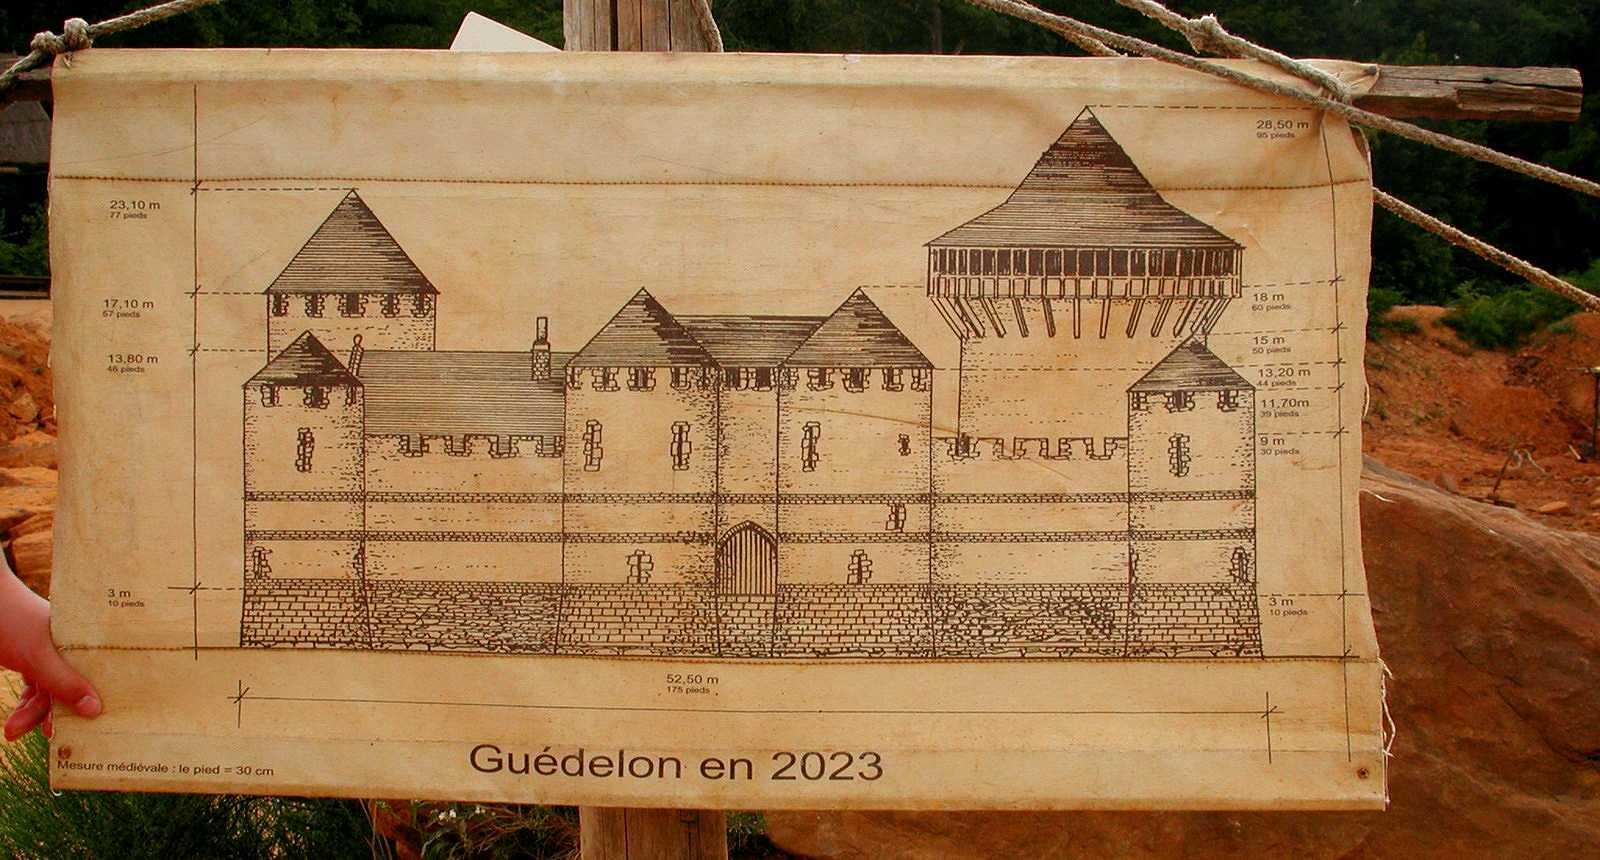 château fort guélédon